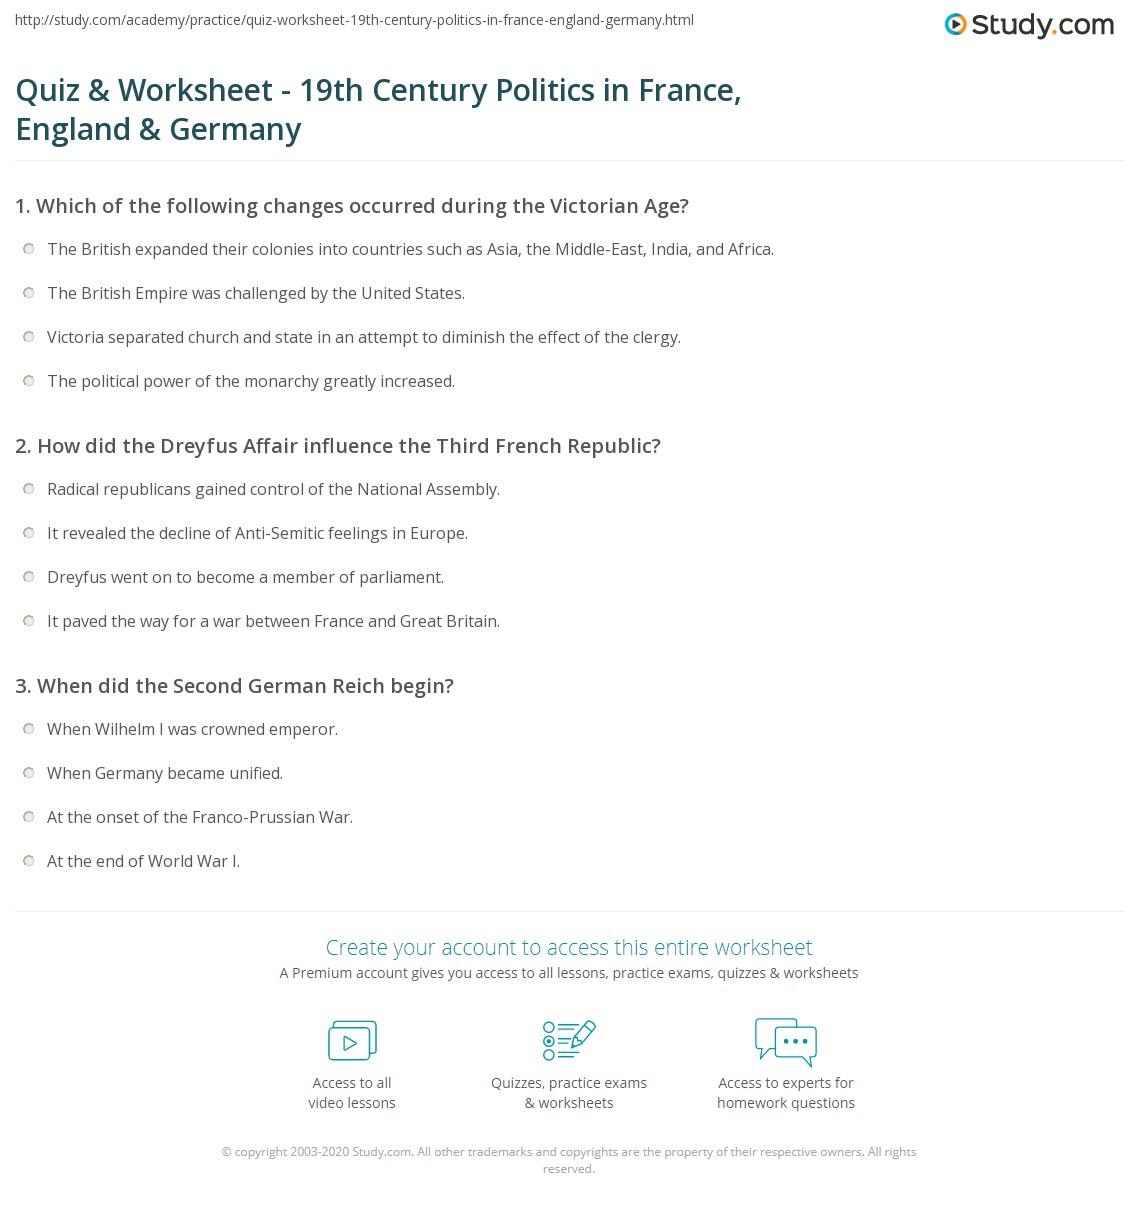 quiz worksheet 19th century politics in france england germany. Black Bedroom Furniture Sets. Home Design Ideas